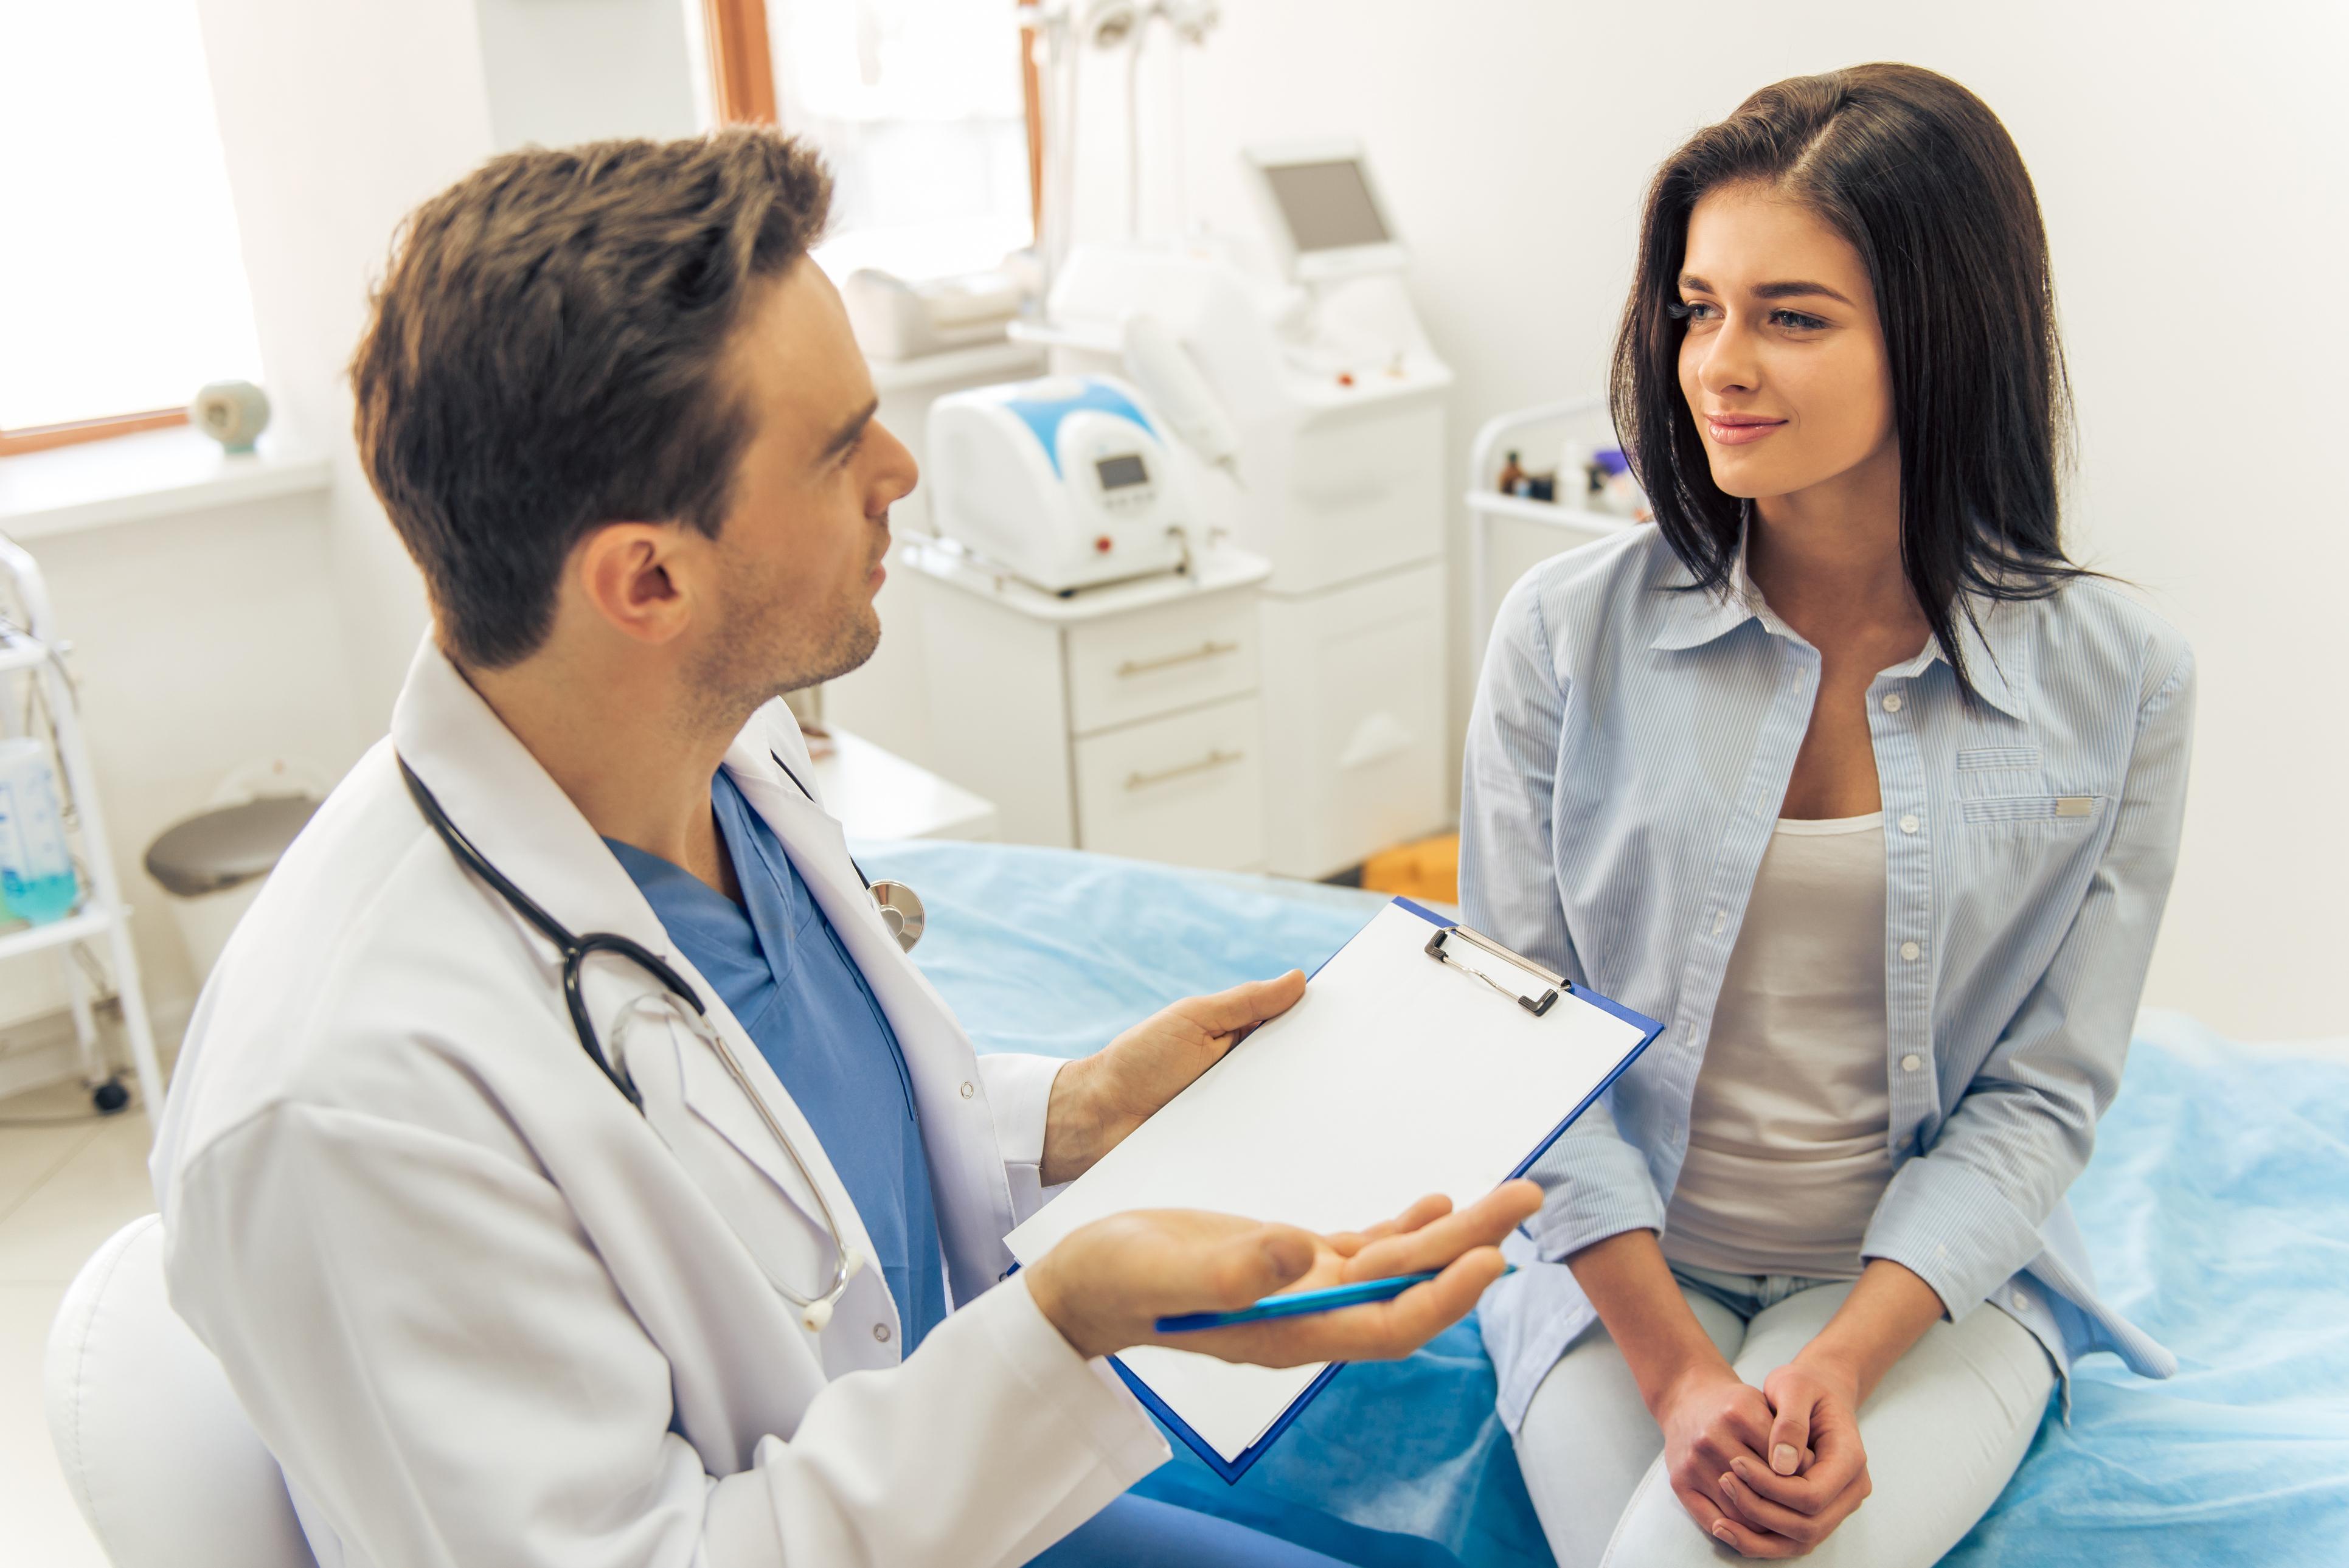 IRS Increases PCORI Fee for Insurers, Self-Insured Health Plan Sponsors